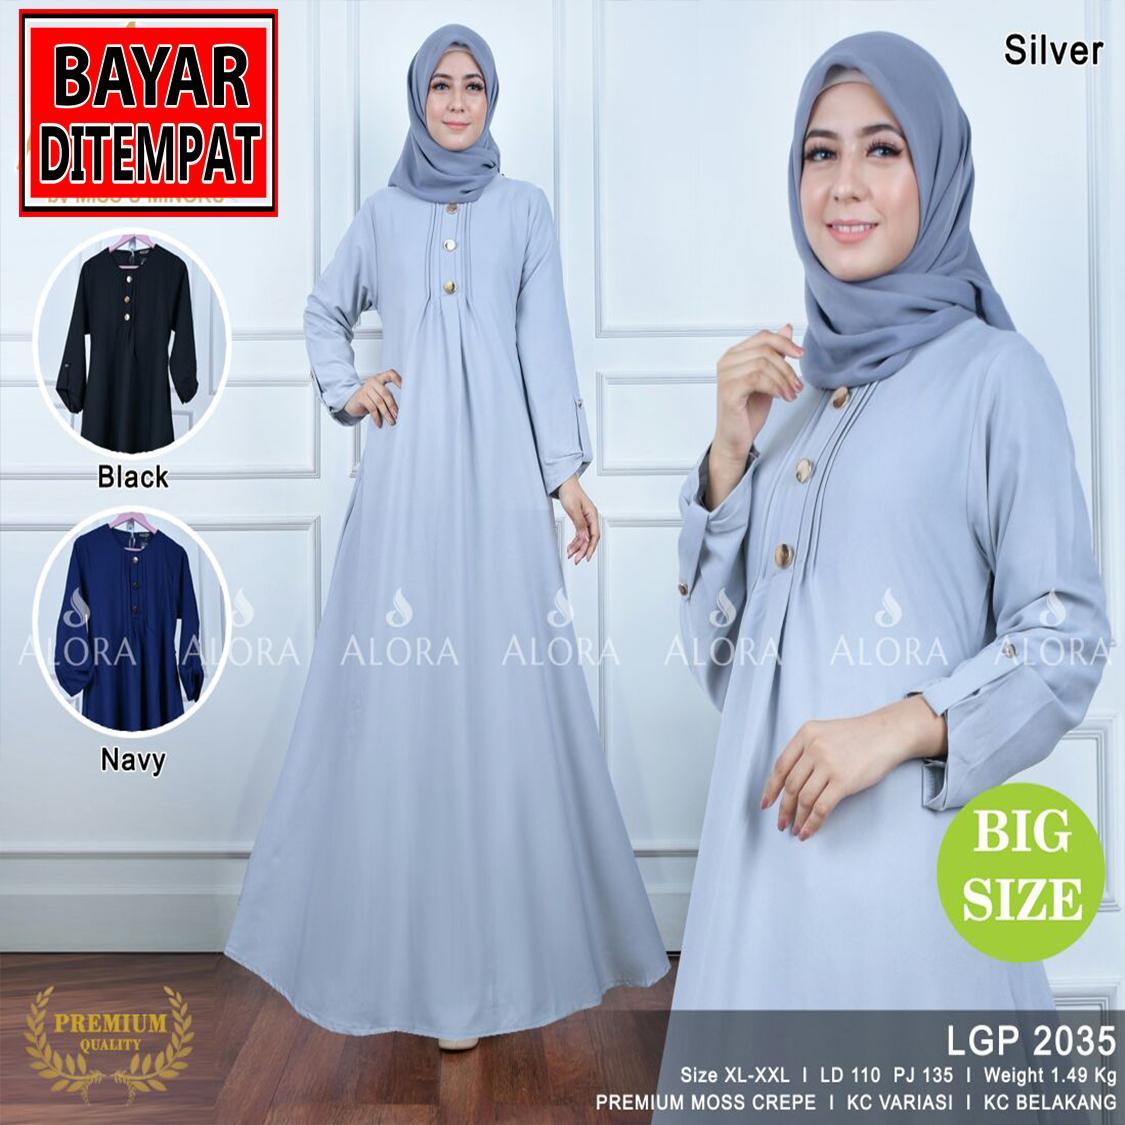 RATU SHOPPING Gamis jumbo size XL XXL Spesial lebaran baju muslim idul fitri ramadhan ceria LGp2035